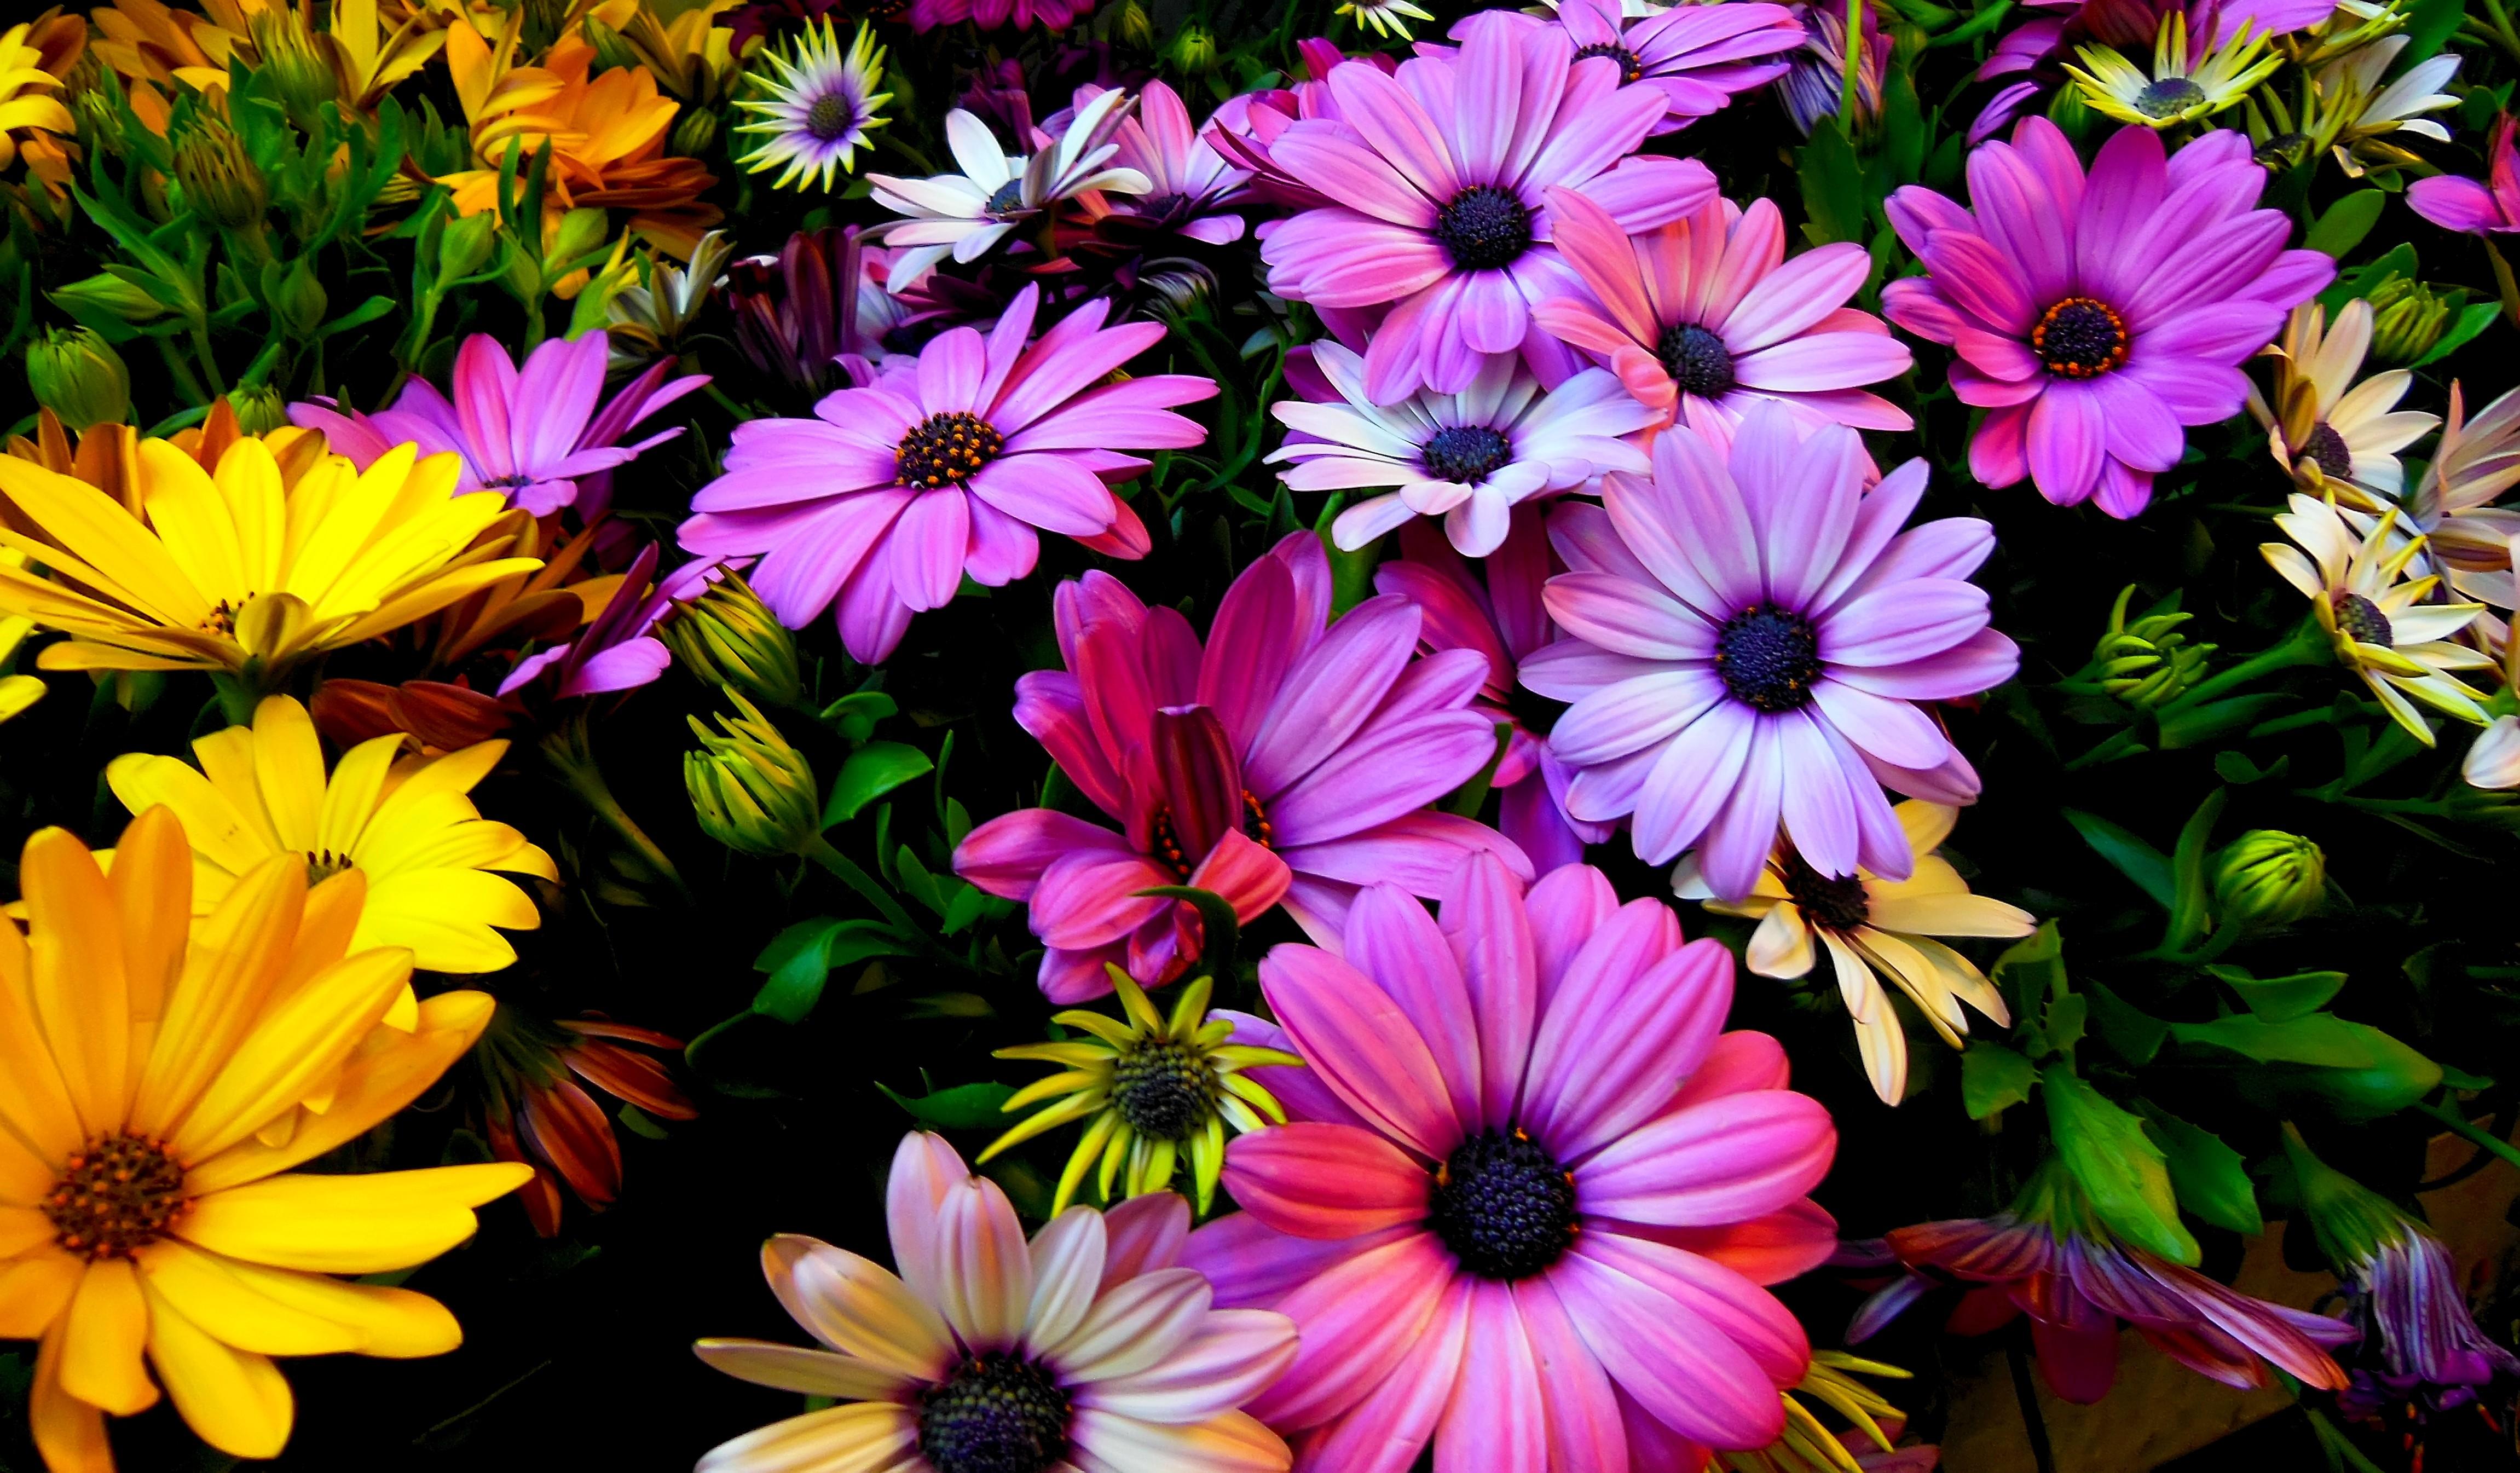 Spring Flowers 4k 4604x2691 Download Hd Wallpaper Wallpapertip